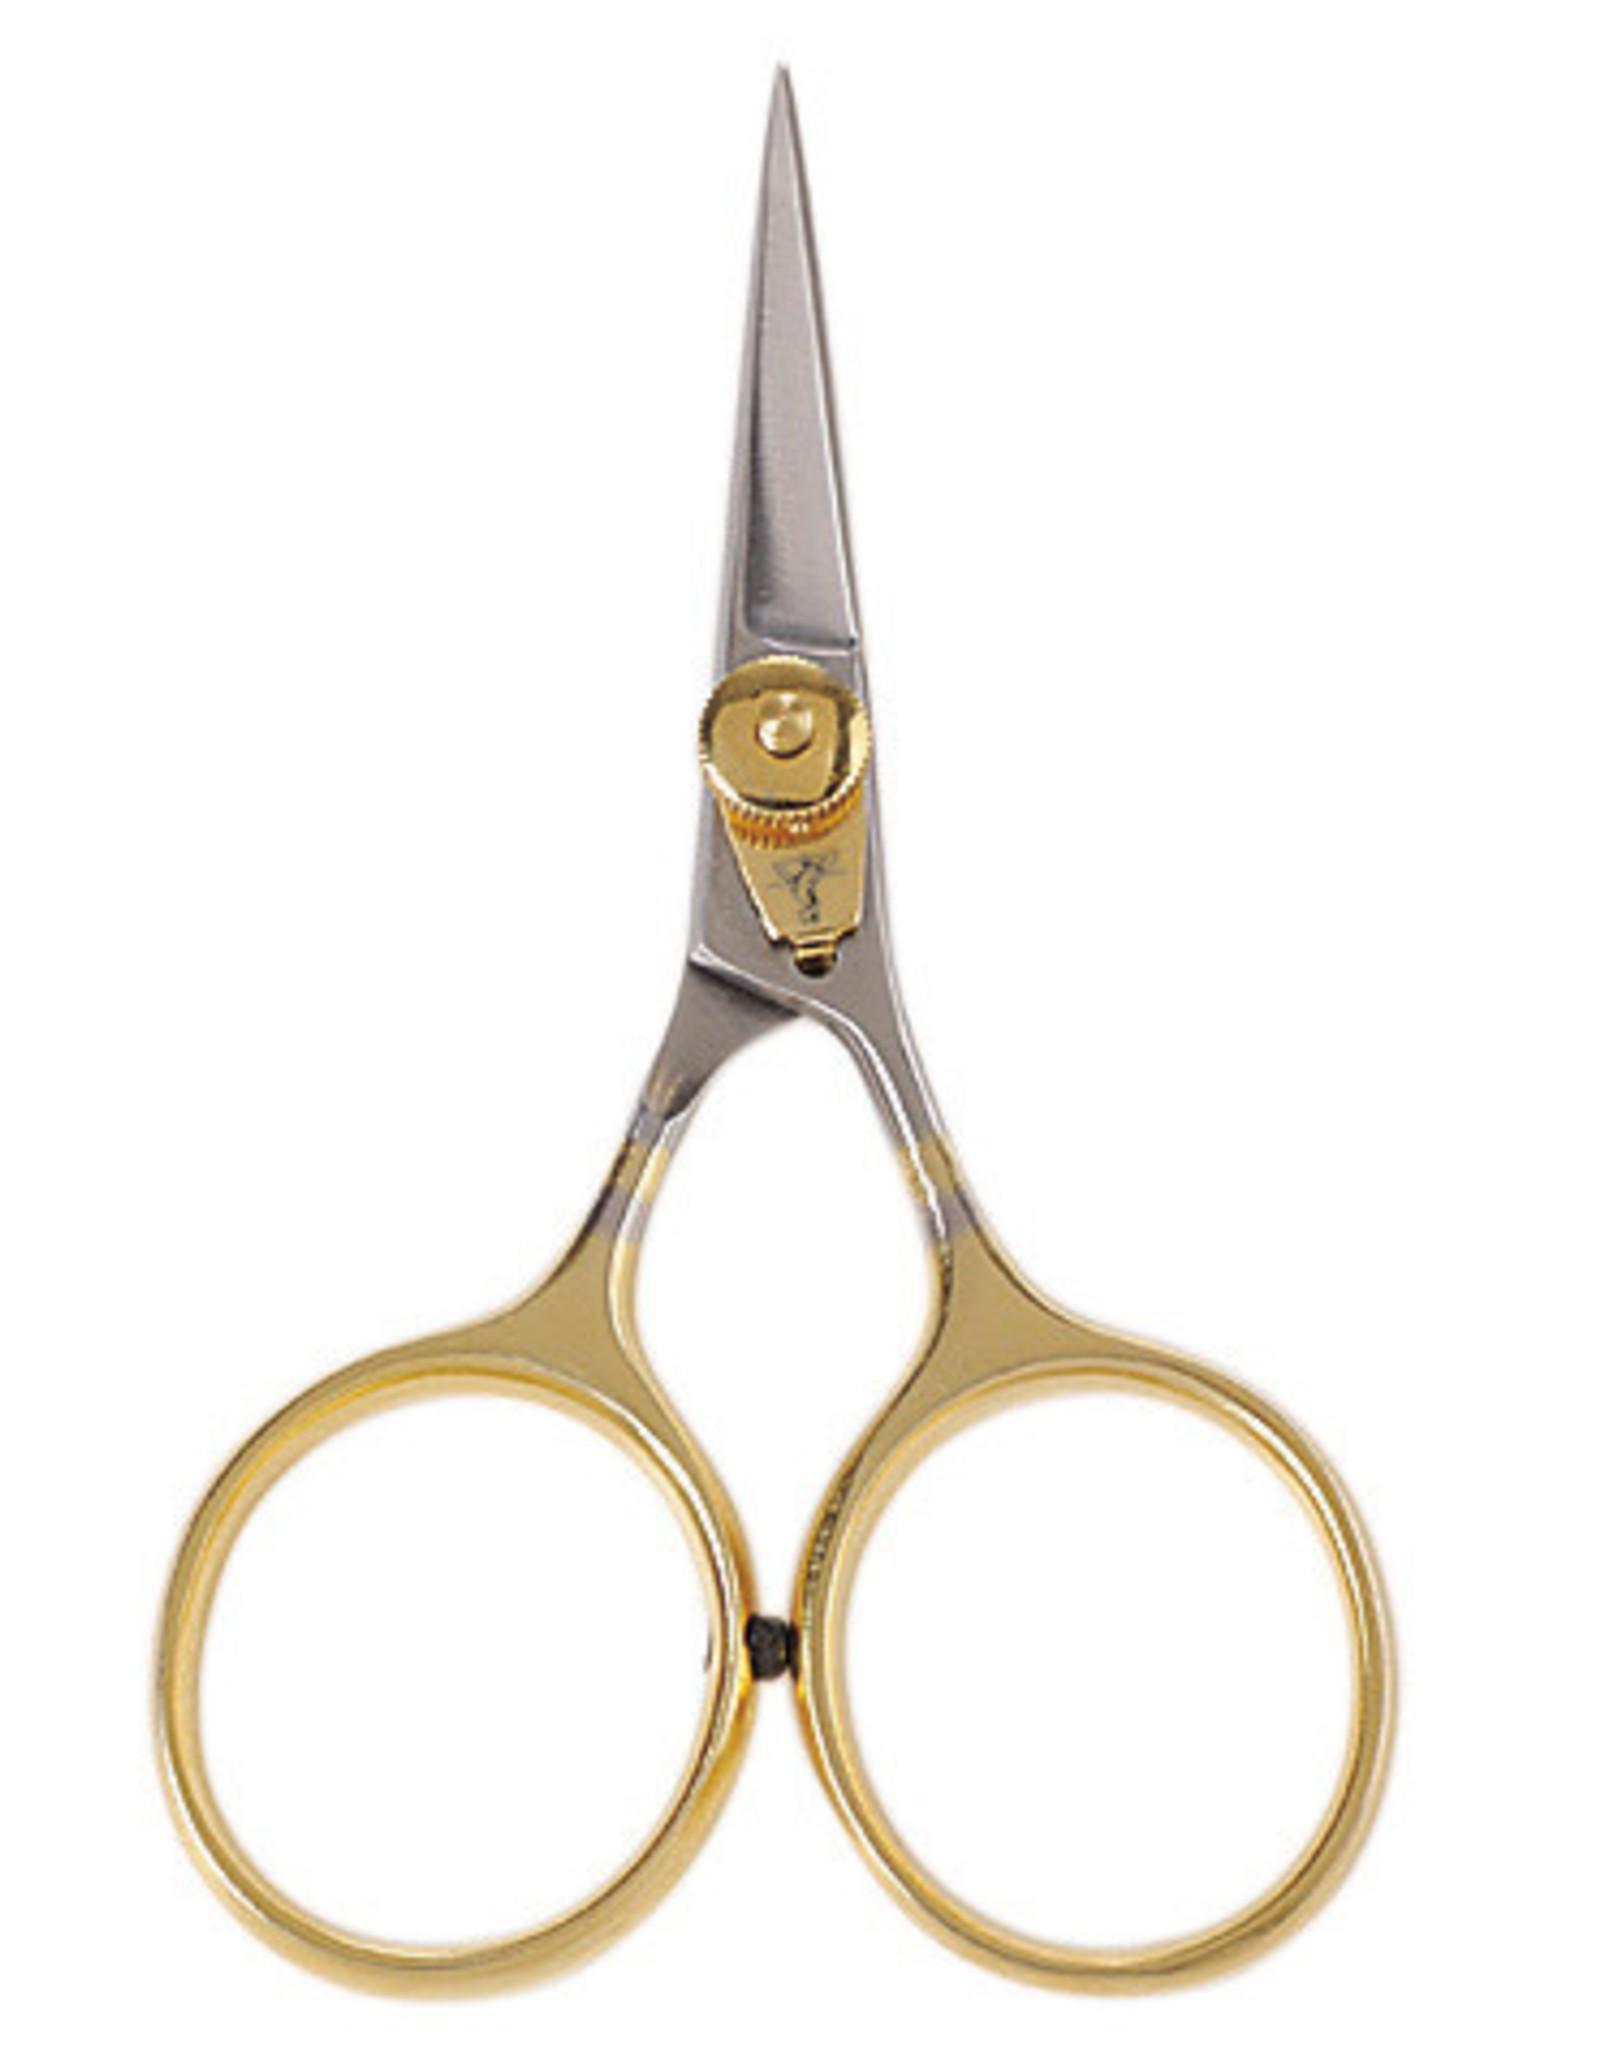 "DR. SLICK Razor Scissor, 4"", Gold Loops, Adjustable Tension, Straight (IMPROVED)"